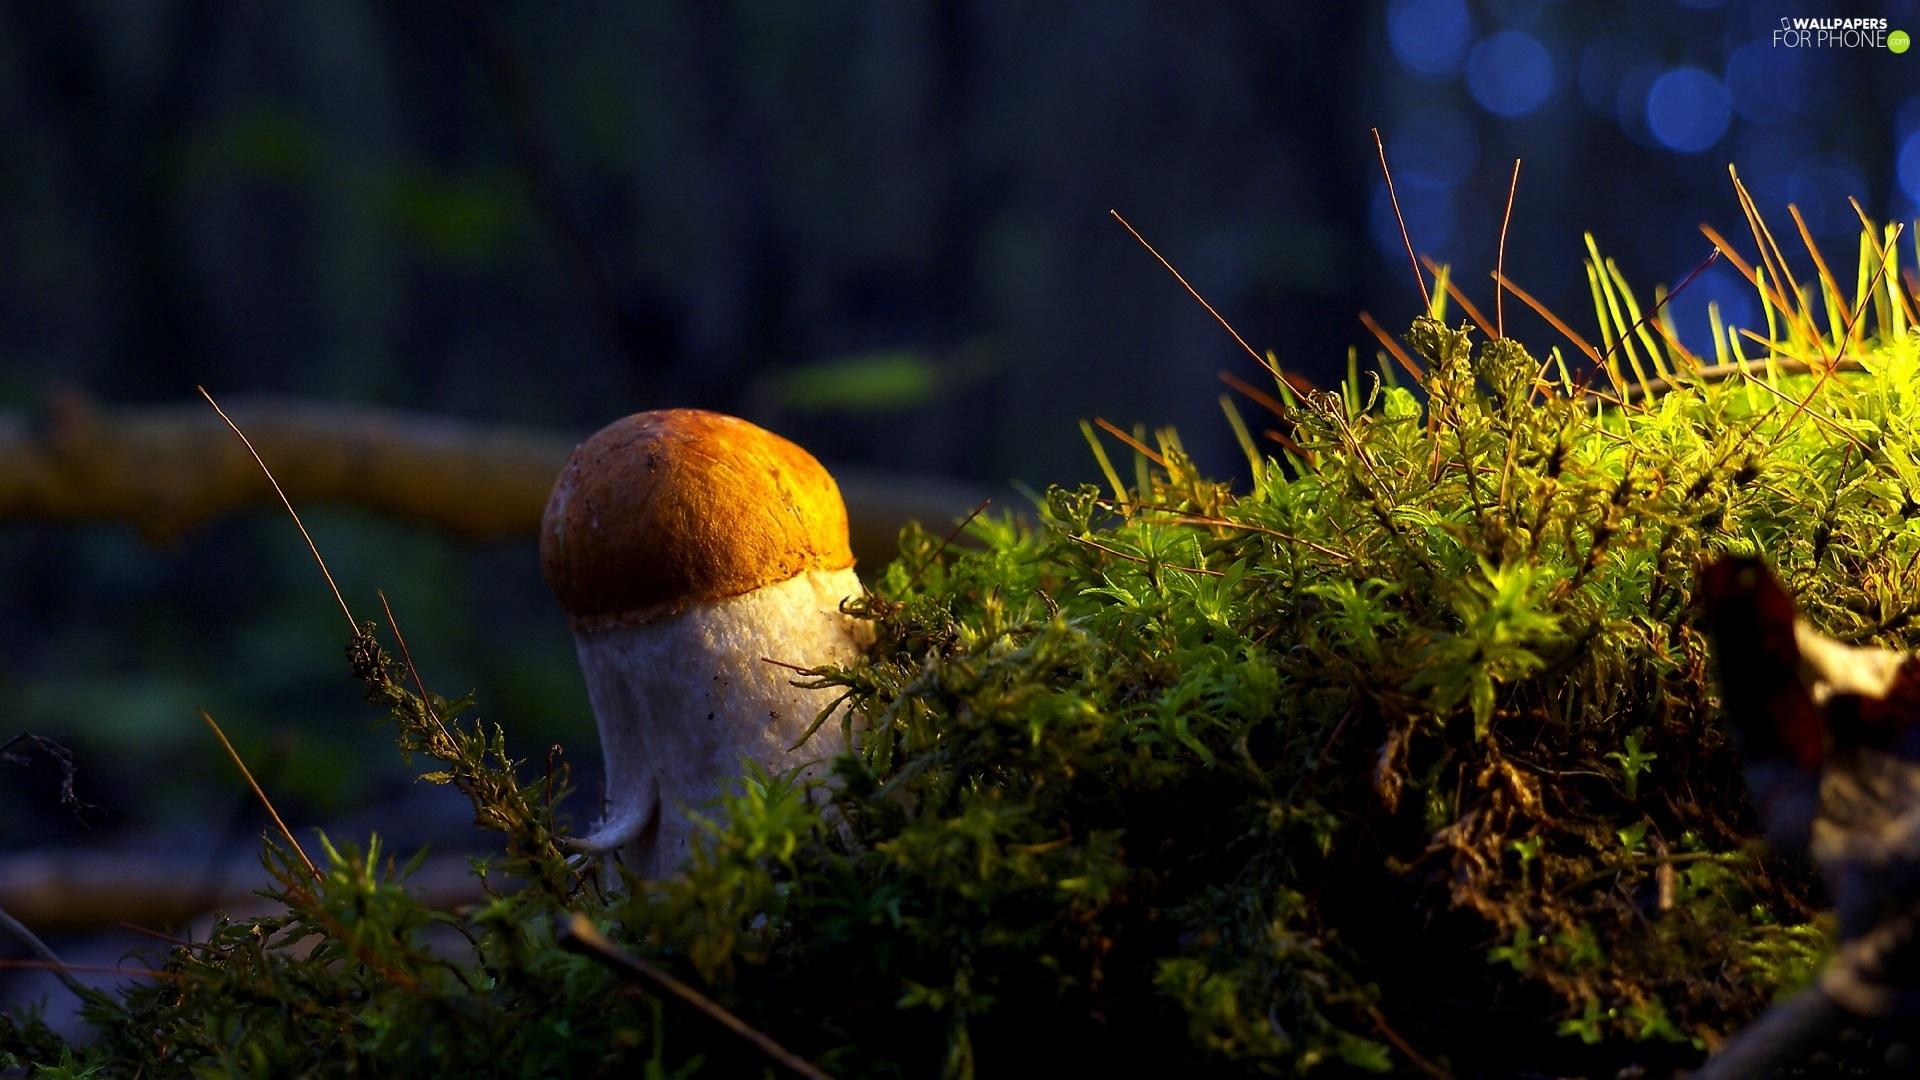 mushroom wallpaper phone - photo #40